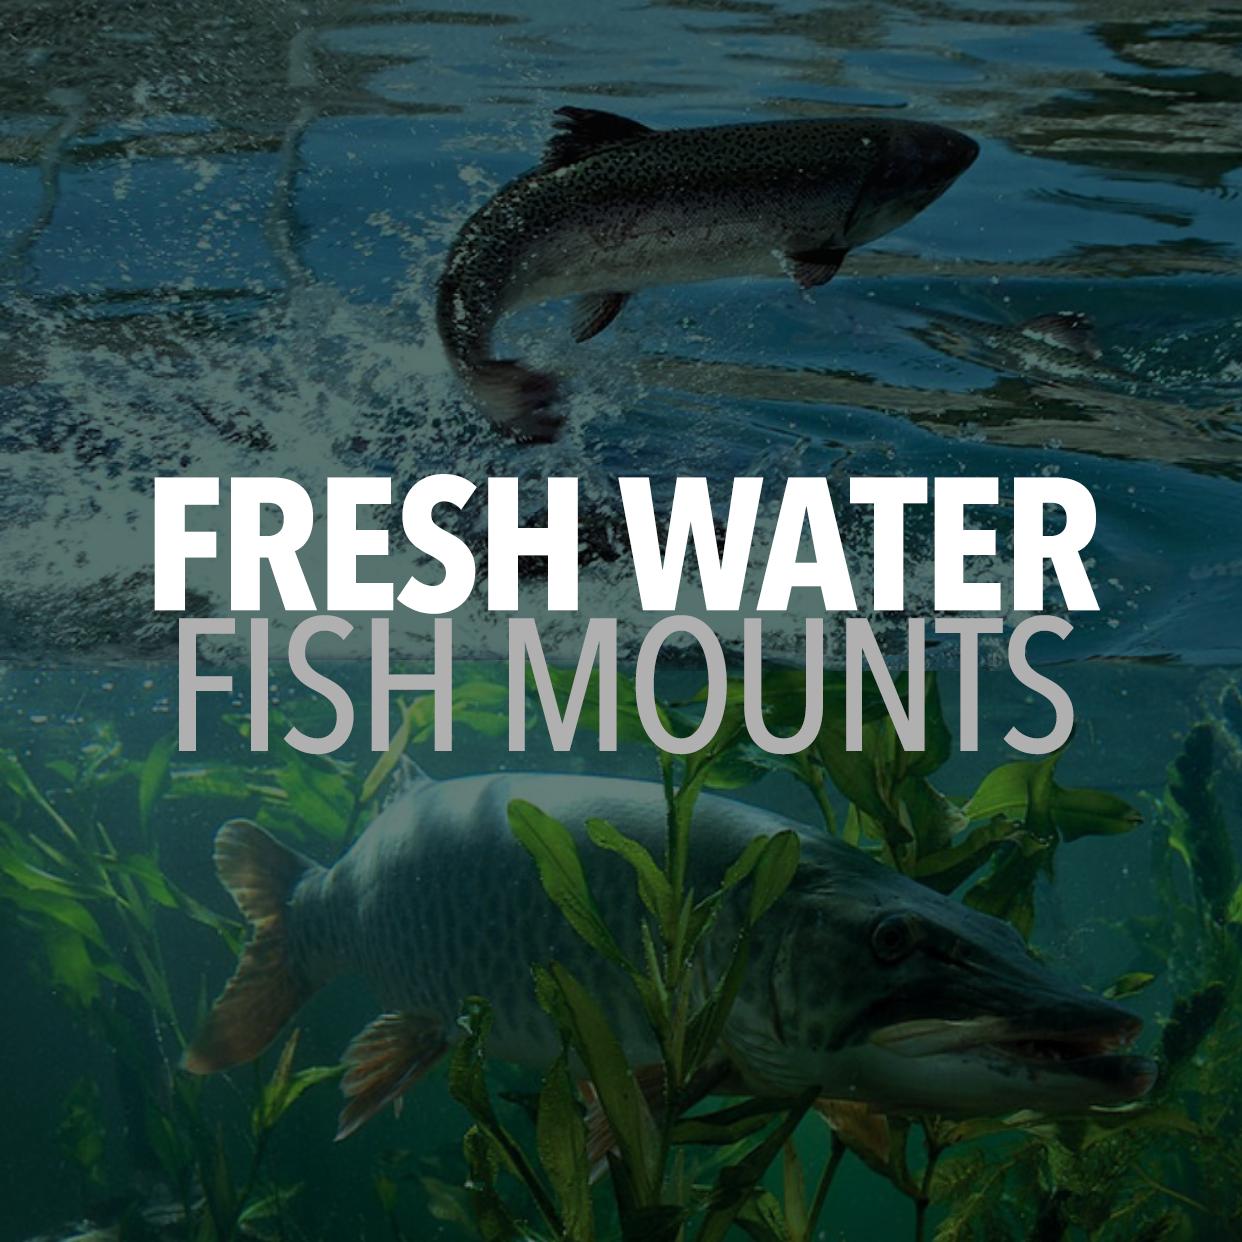 Freshwater fishmounts | Mounted fish | Fish replicas | Fish ...